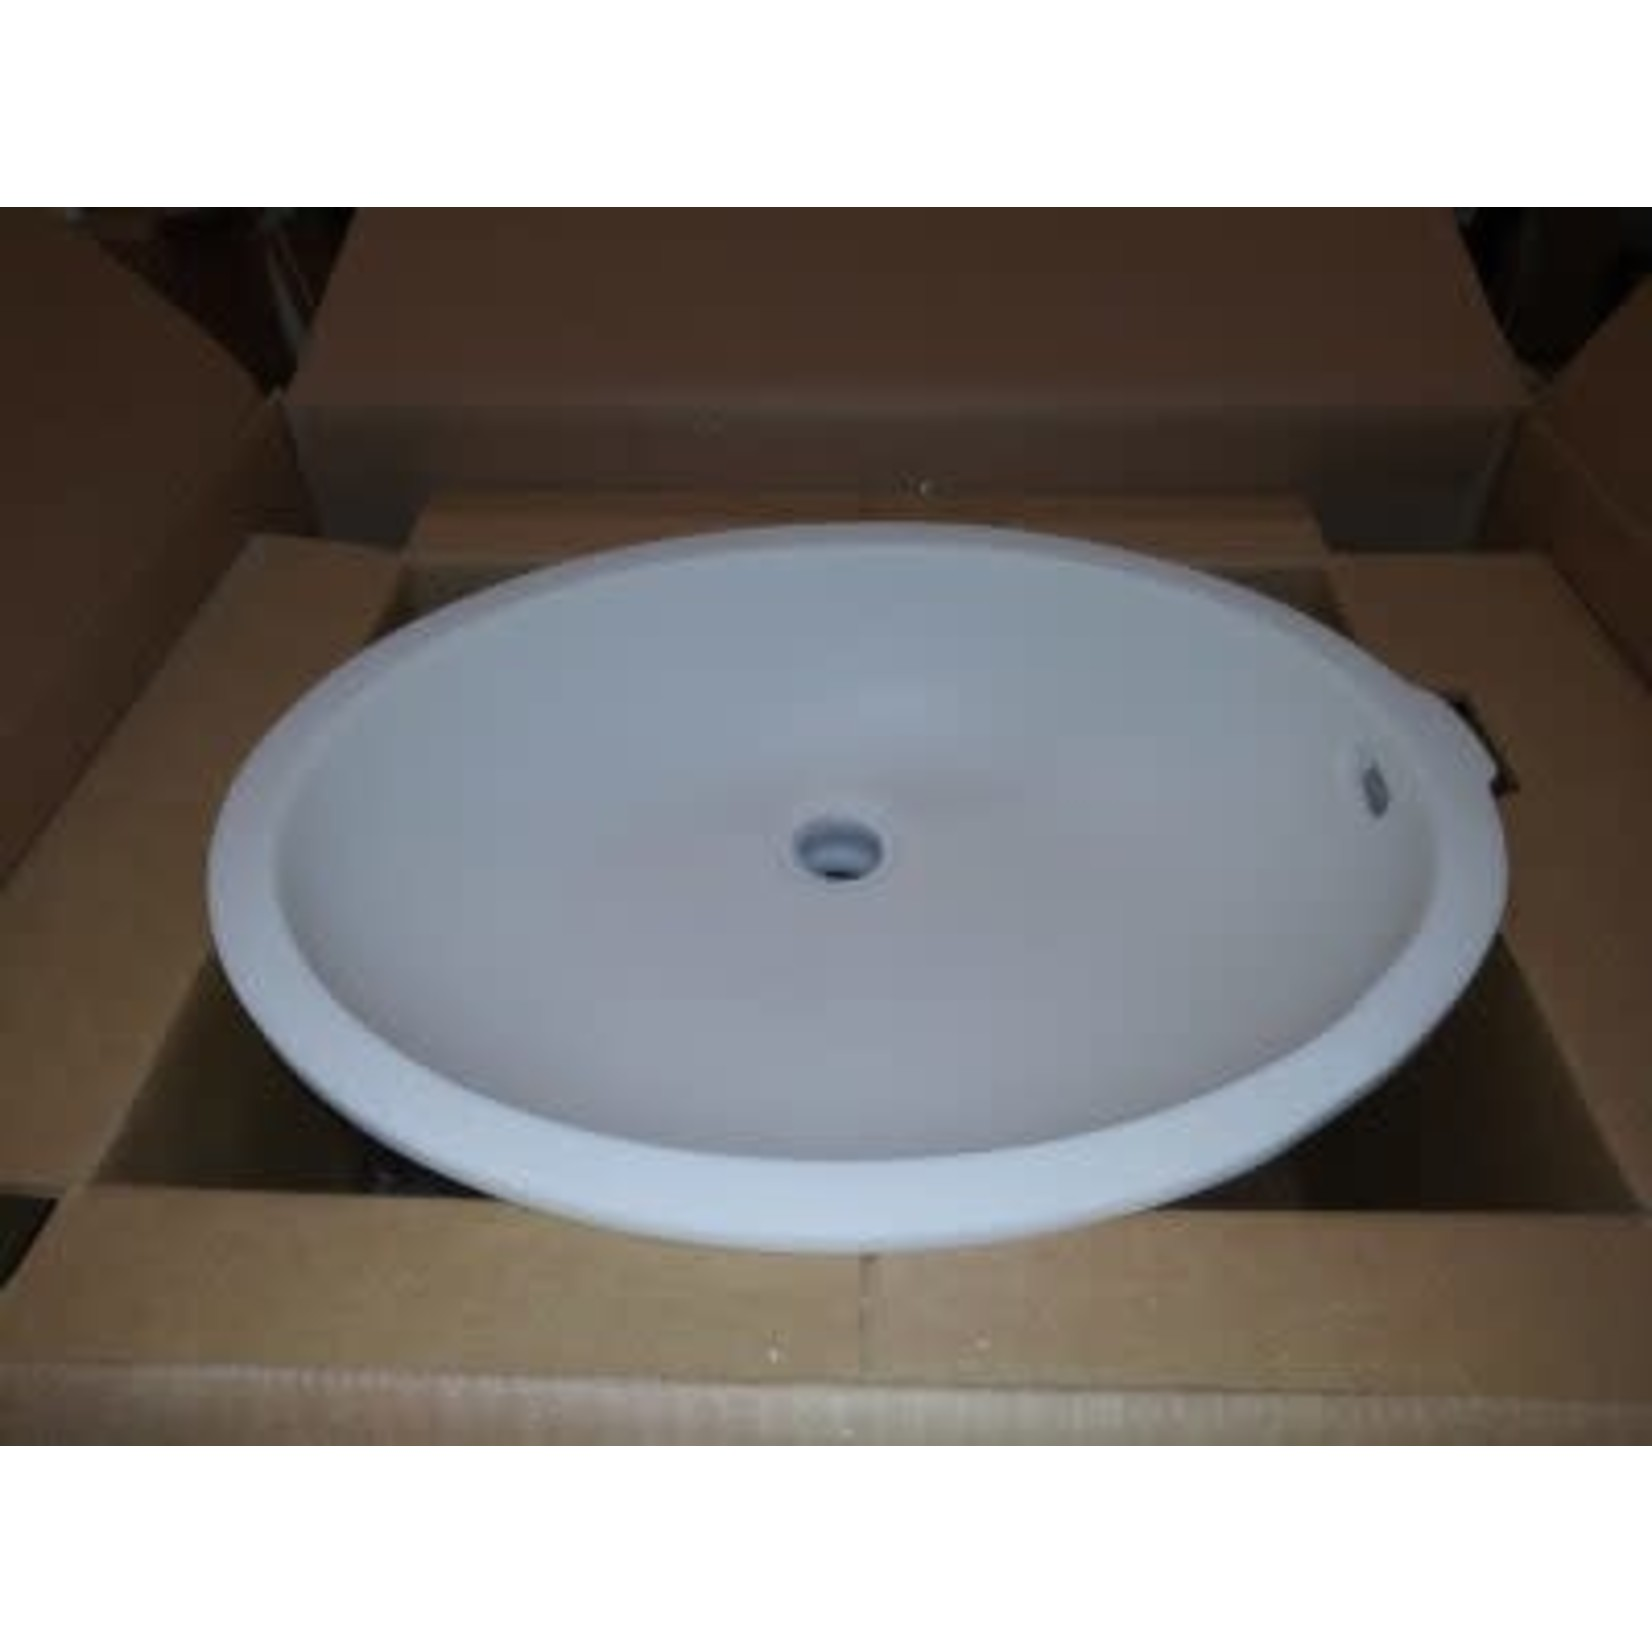 2816 Wilsonart Calm White Oval Vanity Sink